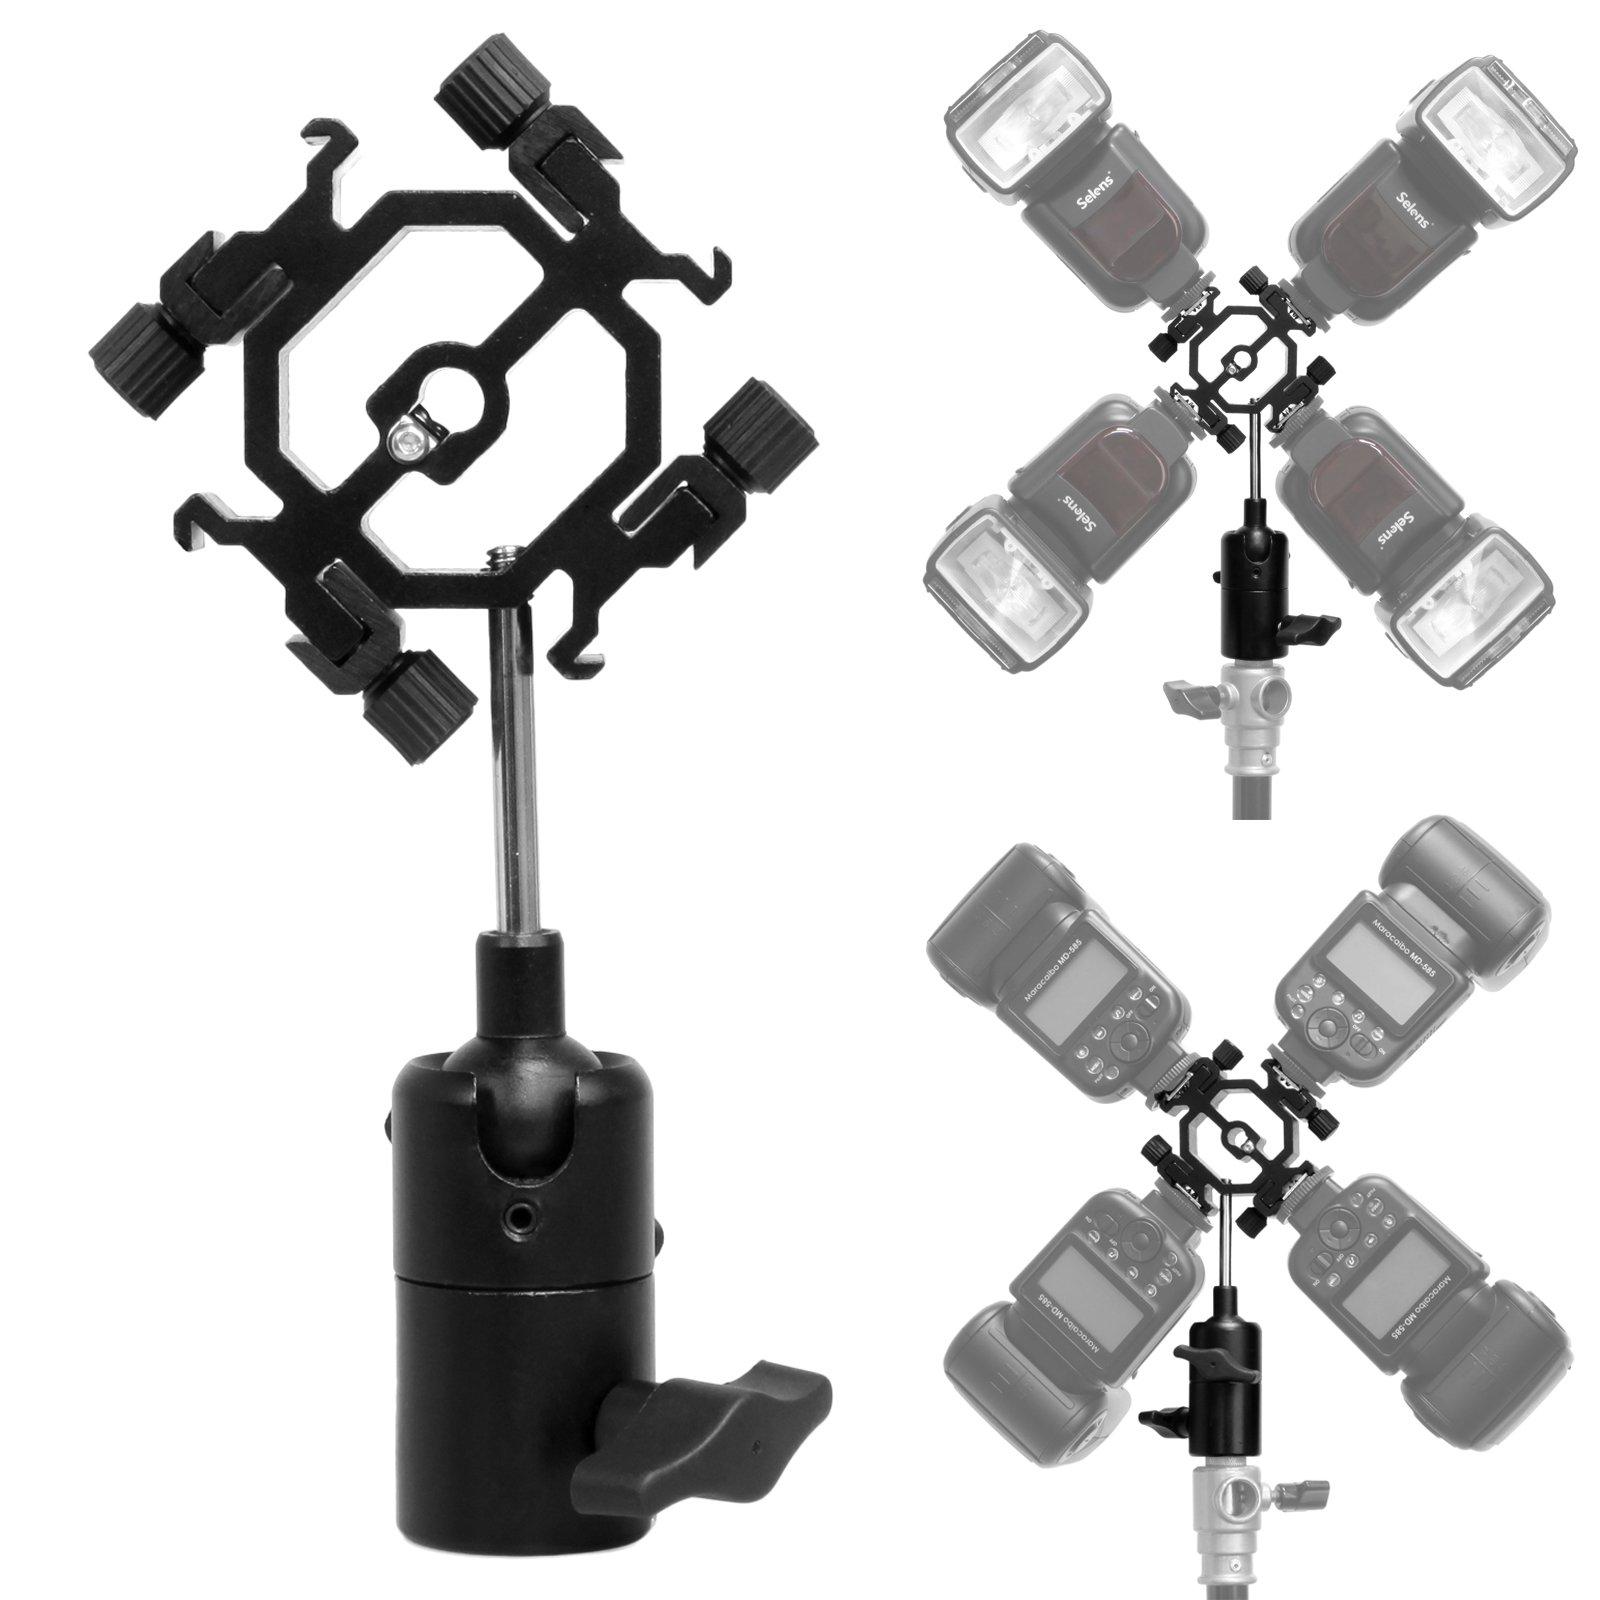 Mekingstudio 4 Way Hot Shoe Mount Light Stand Mount Flash Bracket with Umbrella Holder for Canon Nikon Yongnuo Godox Pentax Sigma Speedlight, LED Monitors, Microphones